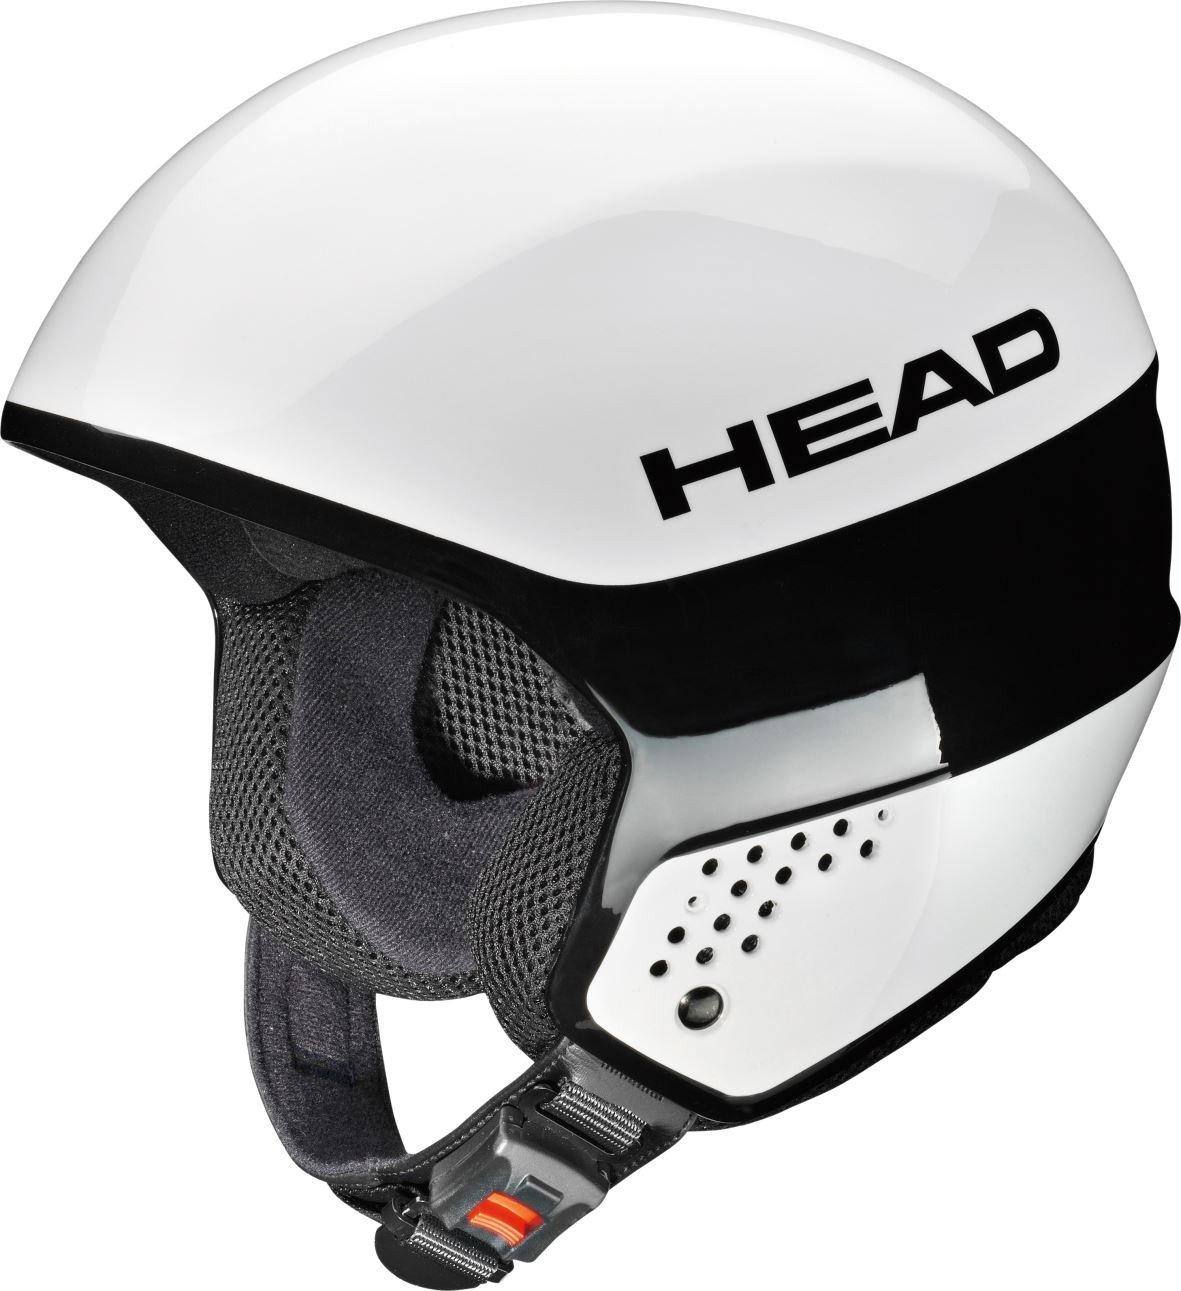 Head Unisex 320004 Skihelm Skihelm Skihelm Stivot Race Carbon schwarz B01BIF6UGS Skihelme Nicht so teuer acc433